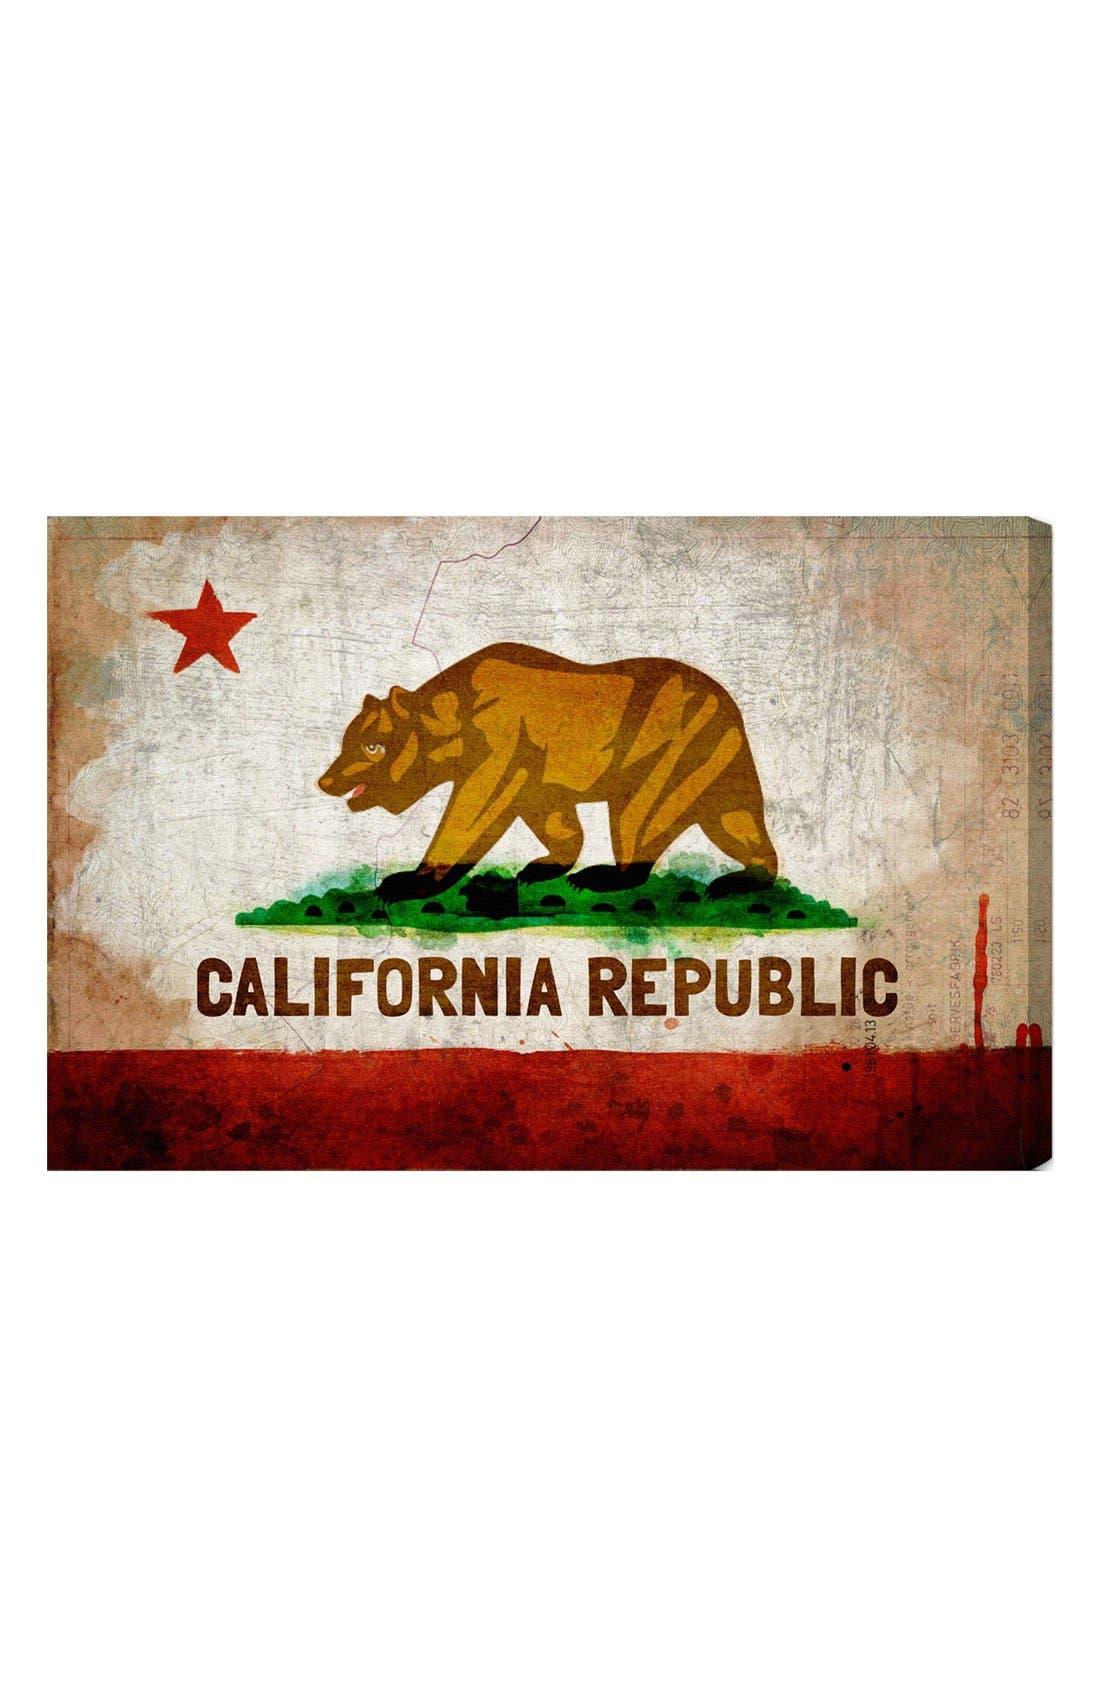 Alternate Image 1 Selected - Oliver Gal 'California Republic' Wall Art